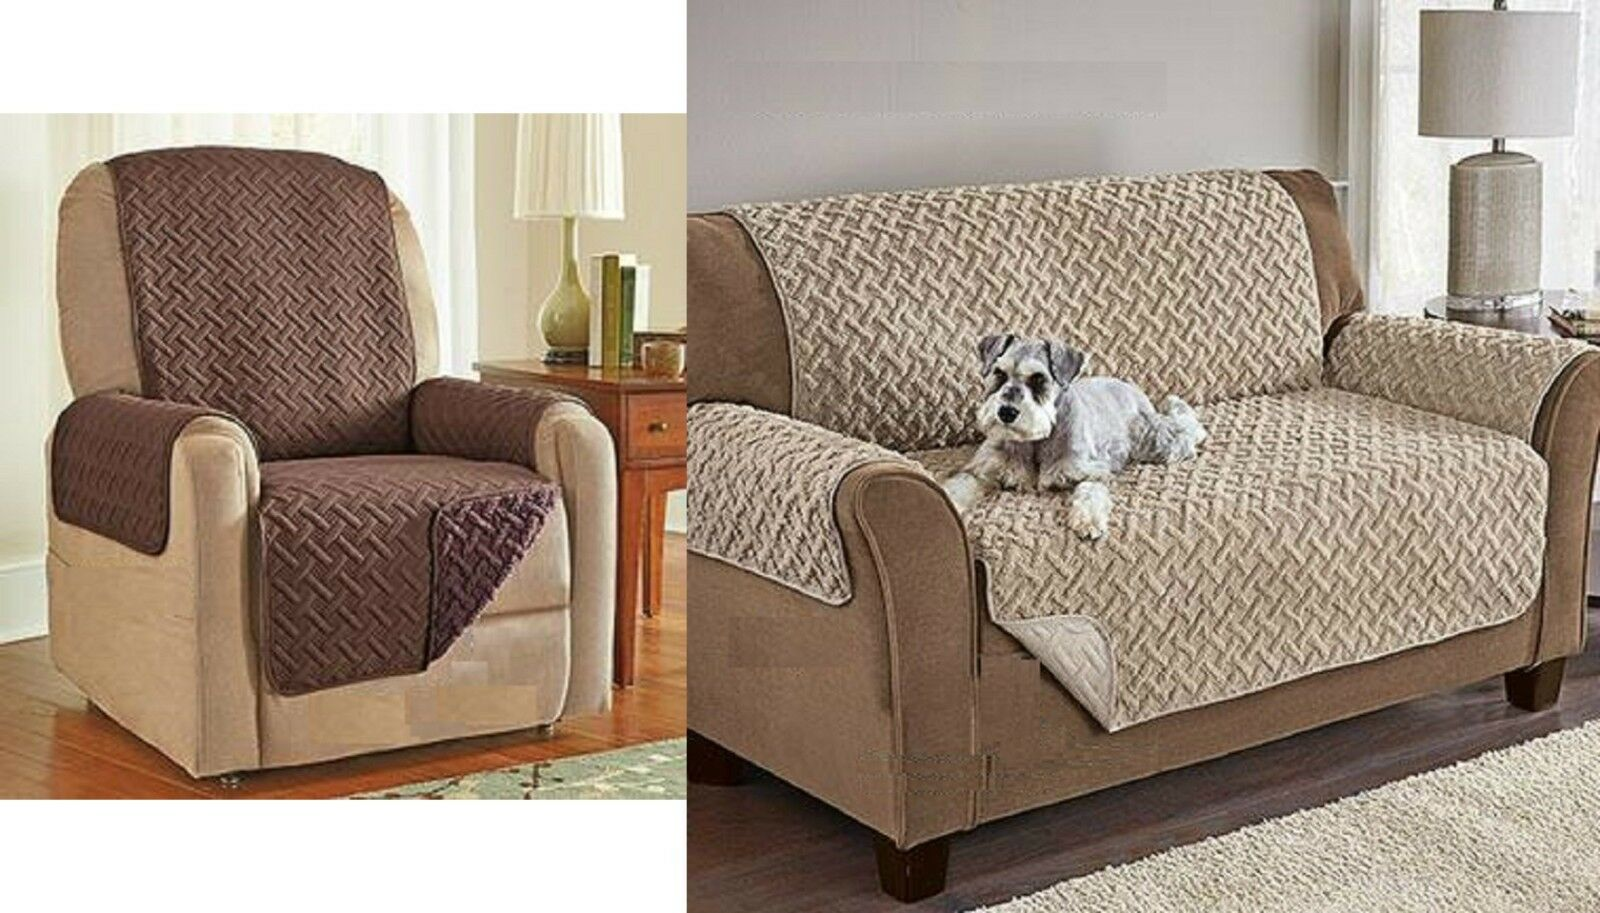 Sherpa Fleece Reversible Recliner Sofa Chair Protector Luxury Brown, Tan QUALITY Furniture